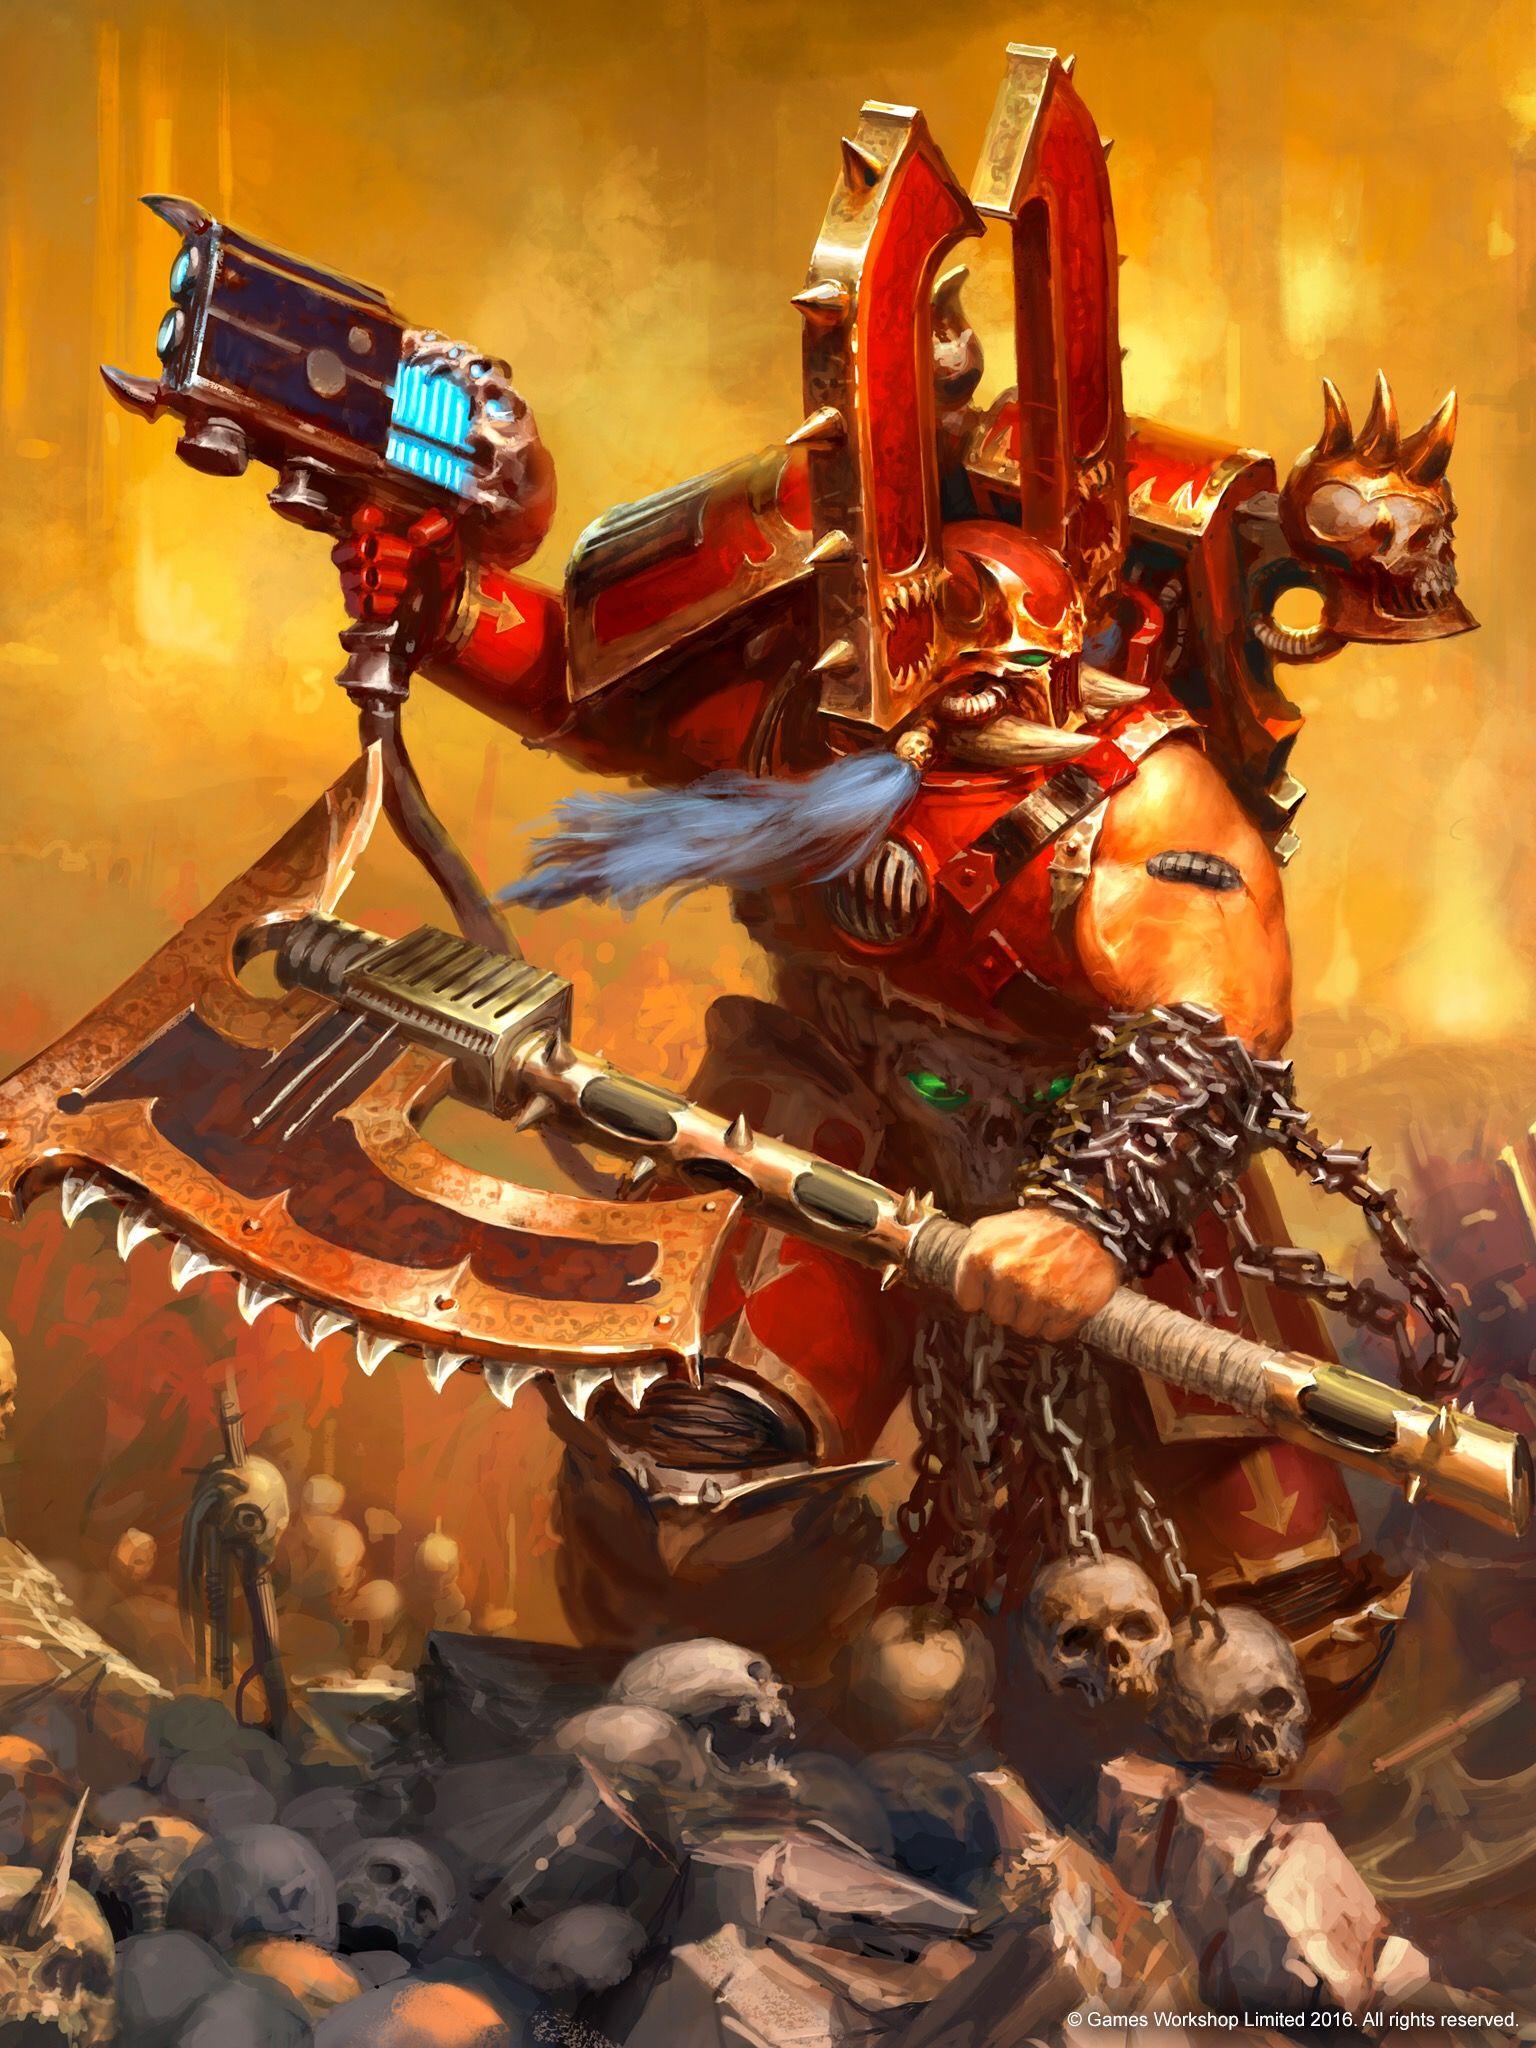 Kharn The Betrayer World Eaters Warhammer 40000 Fendomy 3355850 Jpeg 1536 2048 Warhammer Warhammer 40k Artwork Warhammer 40k